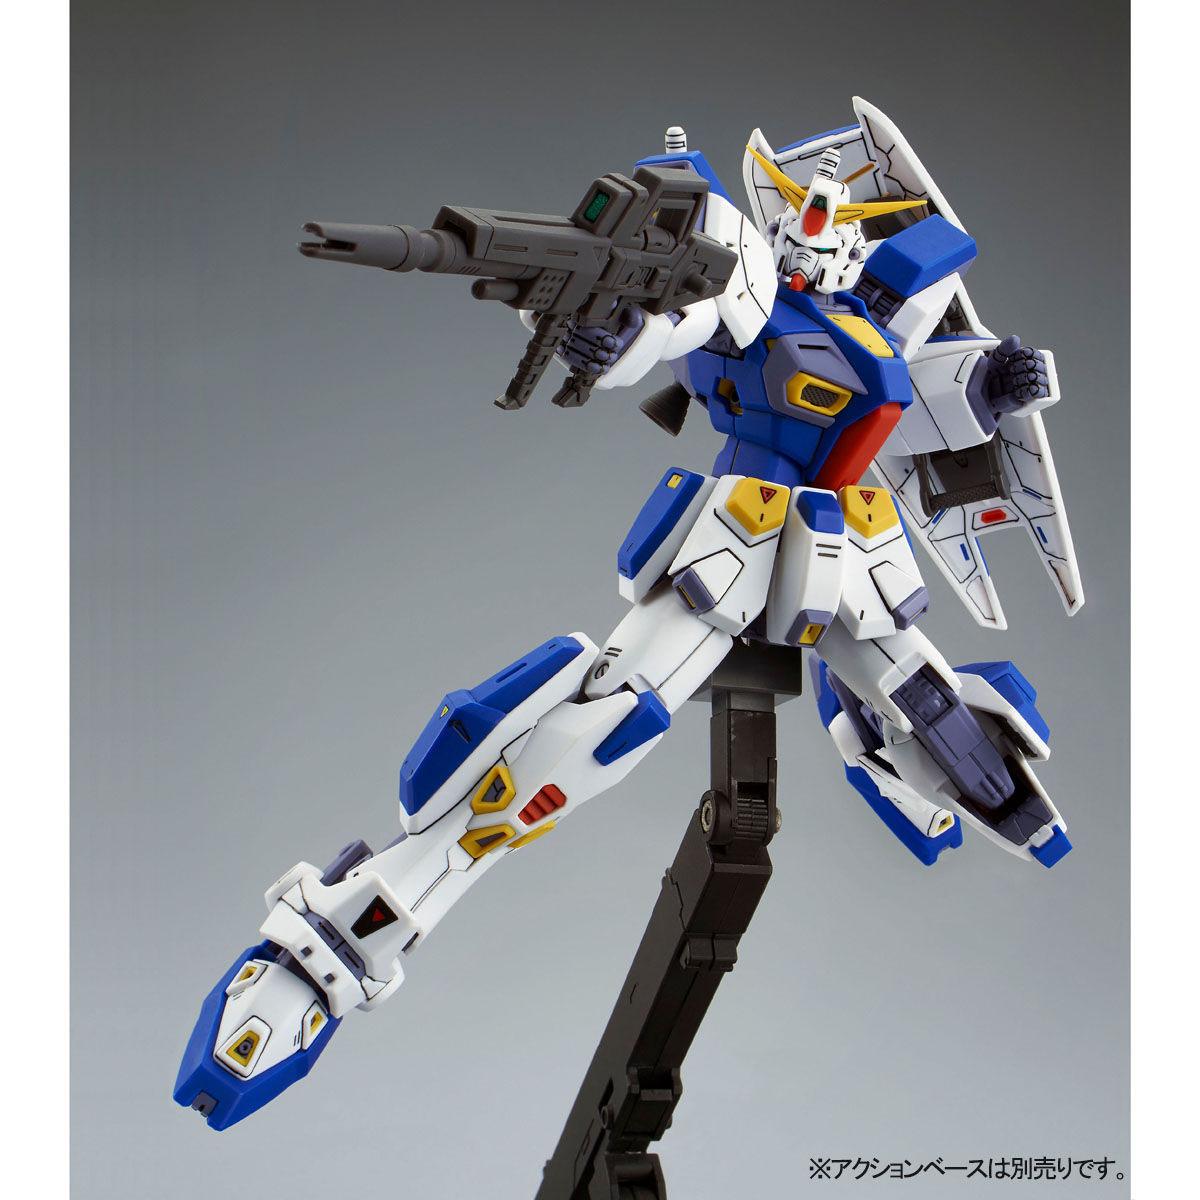 MG 1/100『ガンダムF90』プラモデル-004